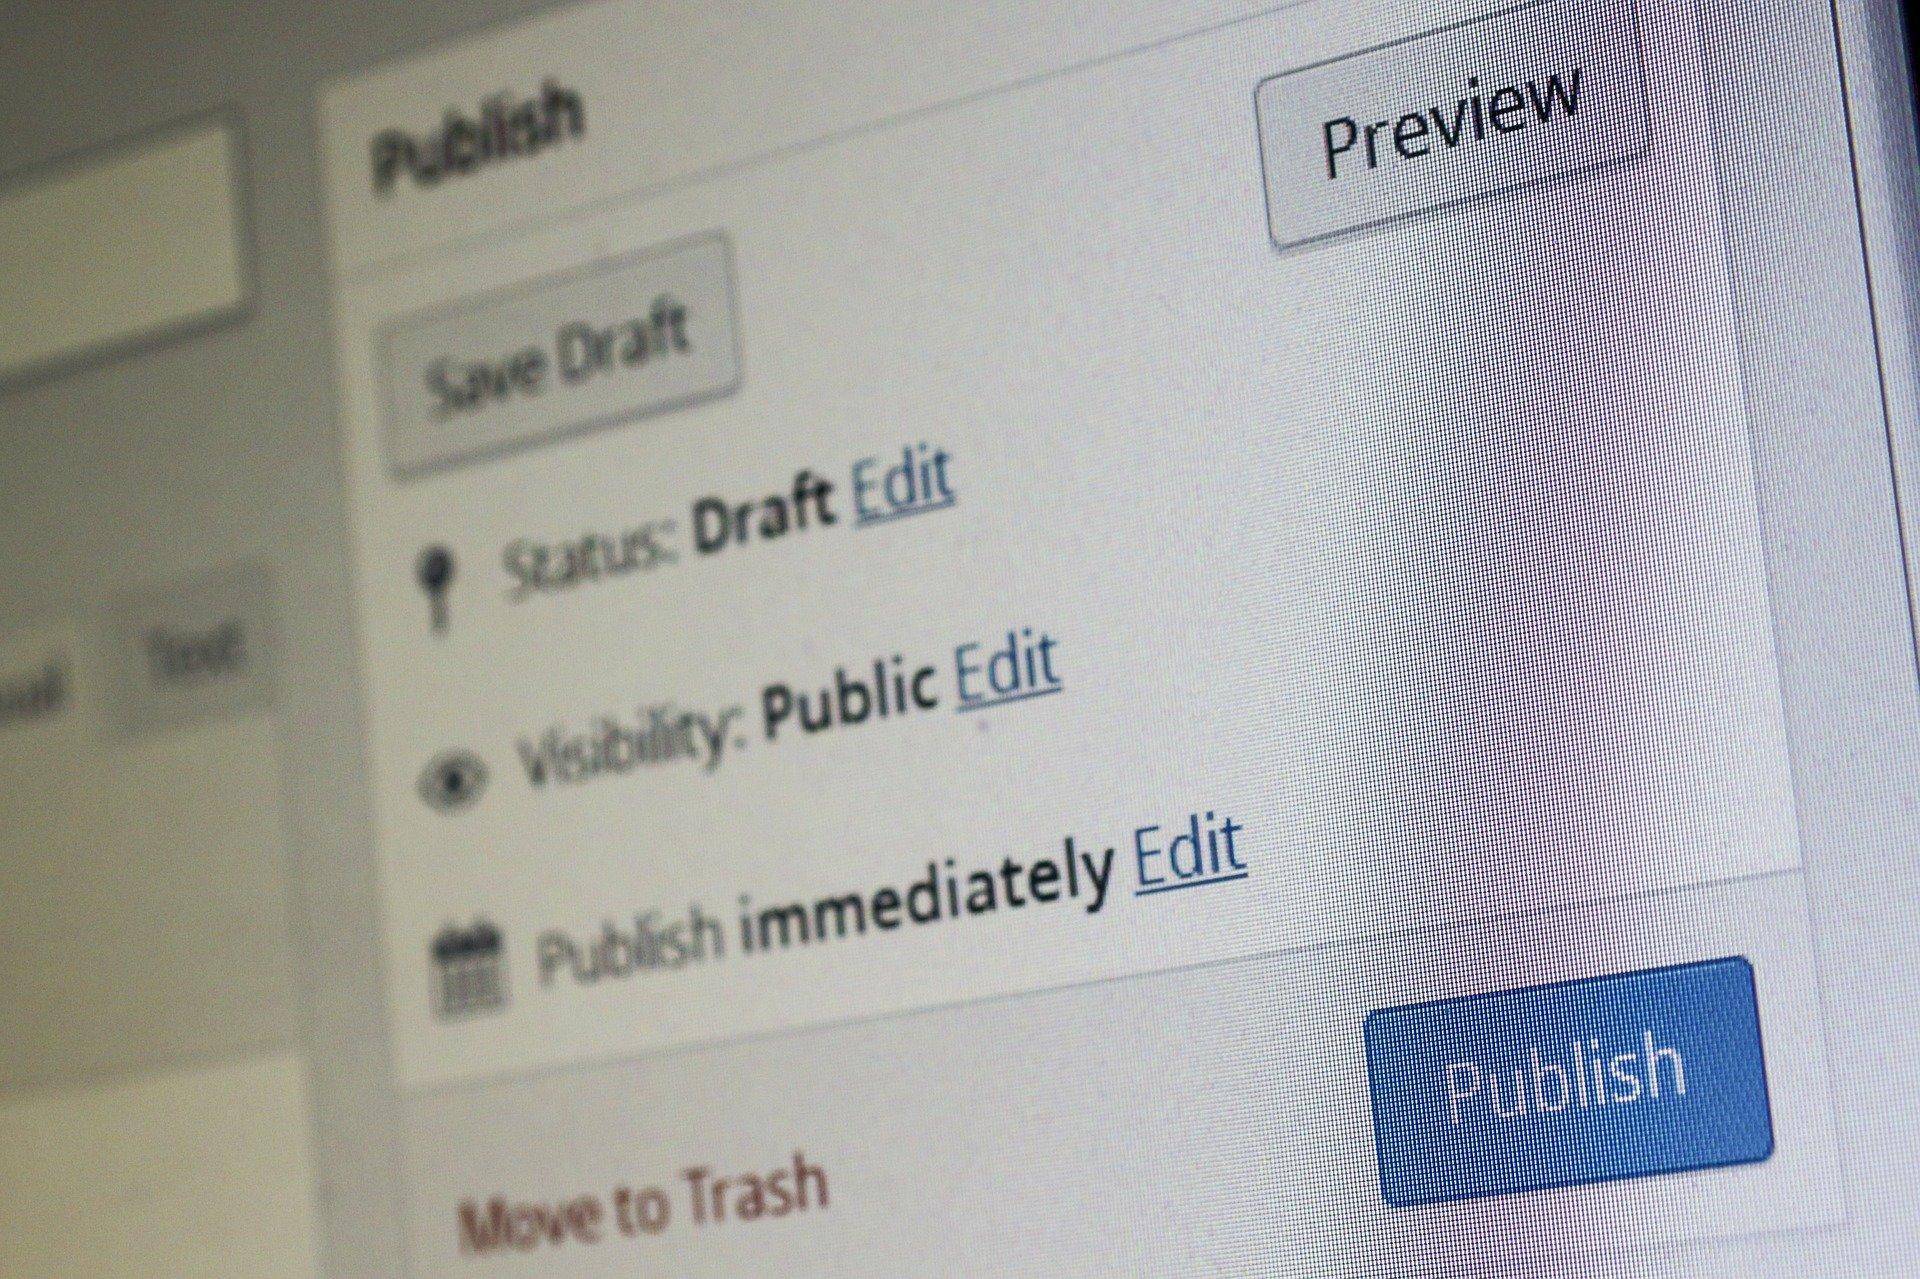 pixabay.com/pixelcreatures